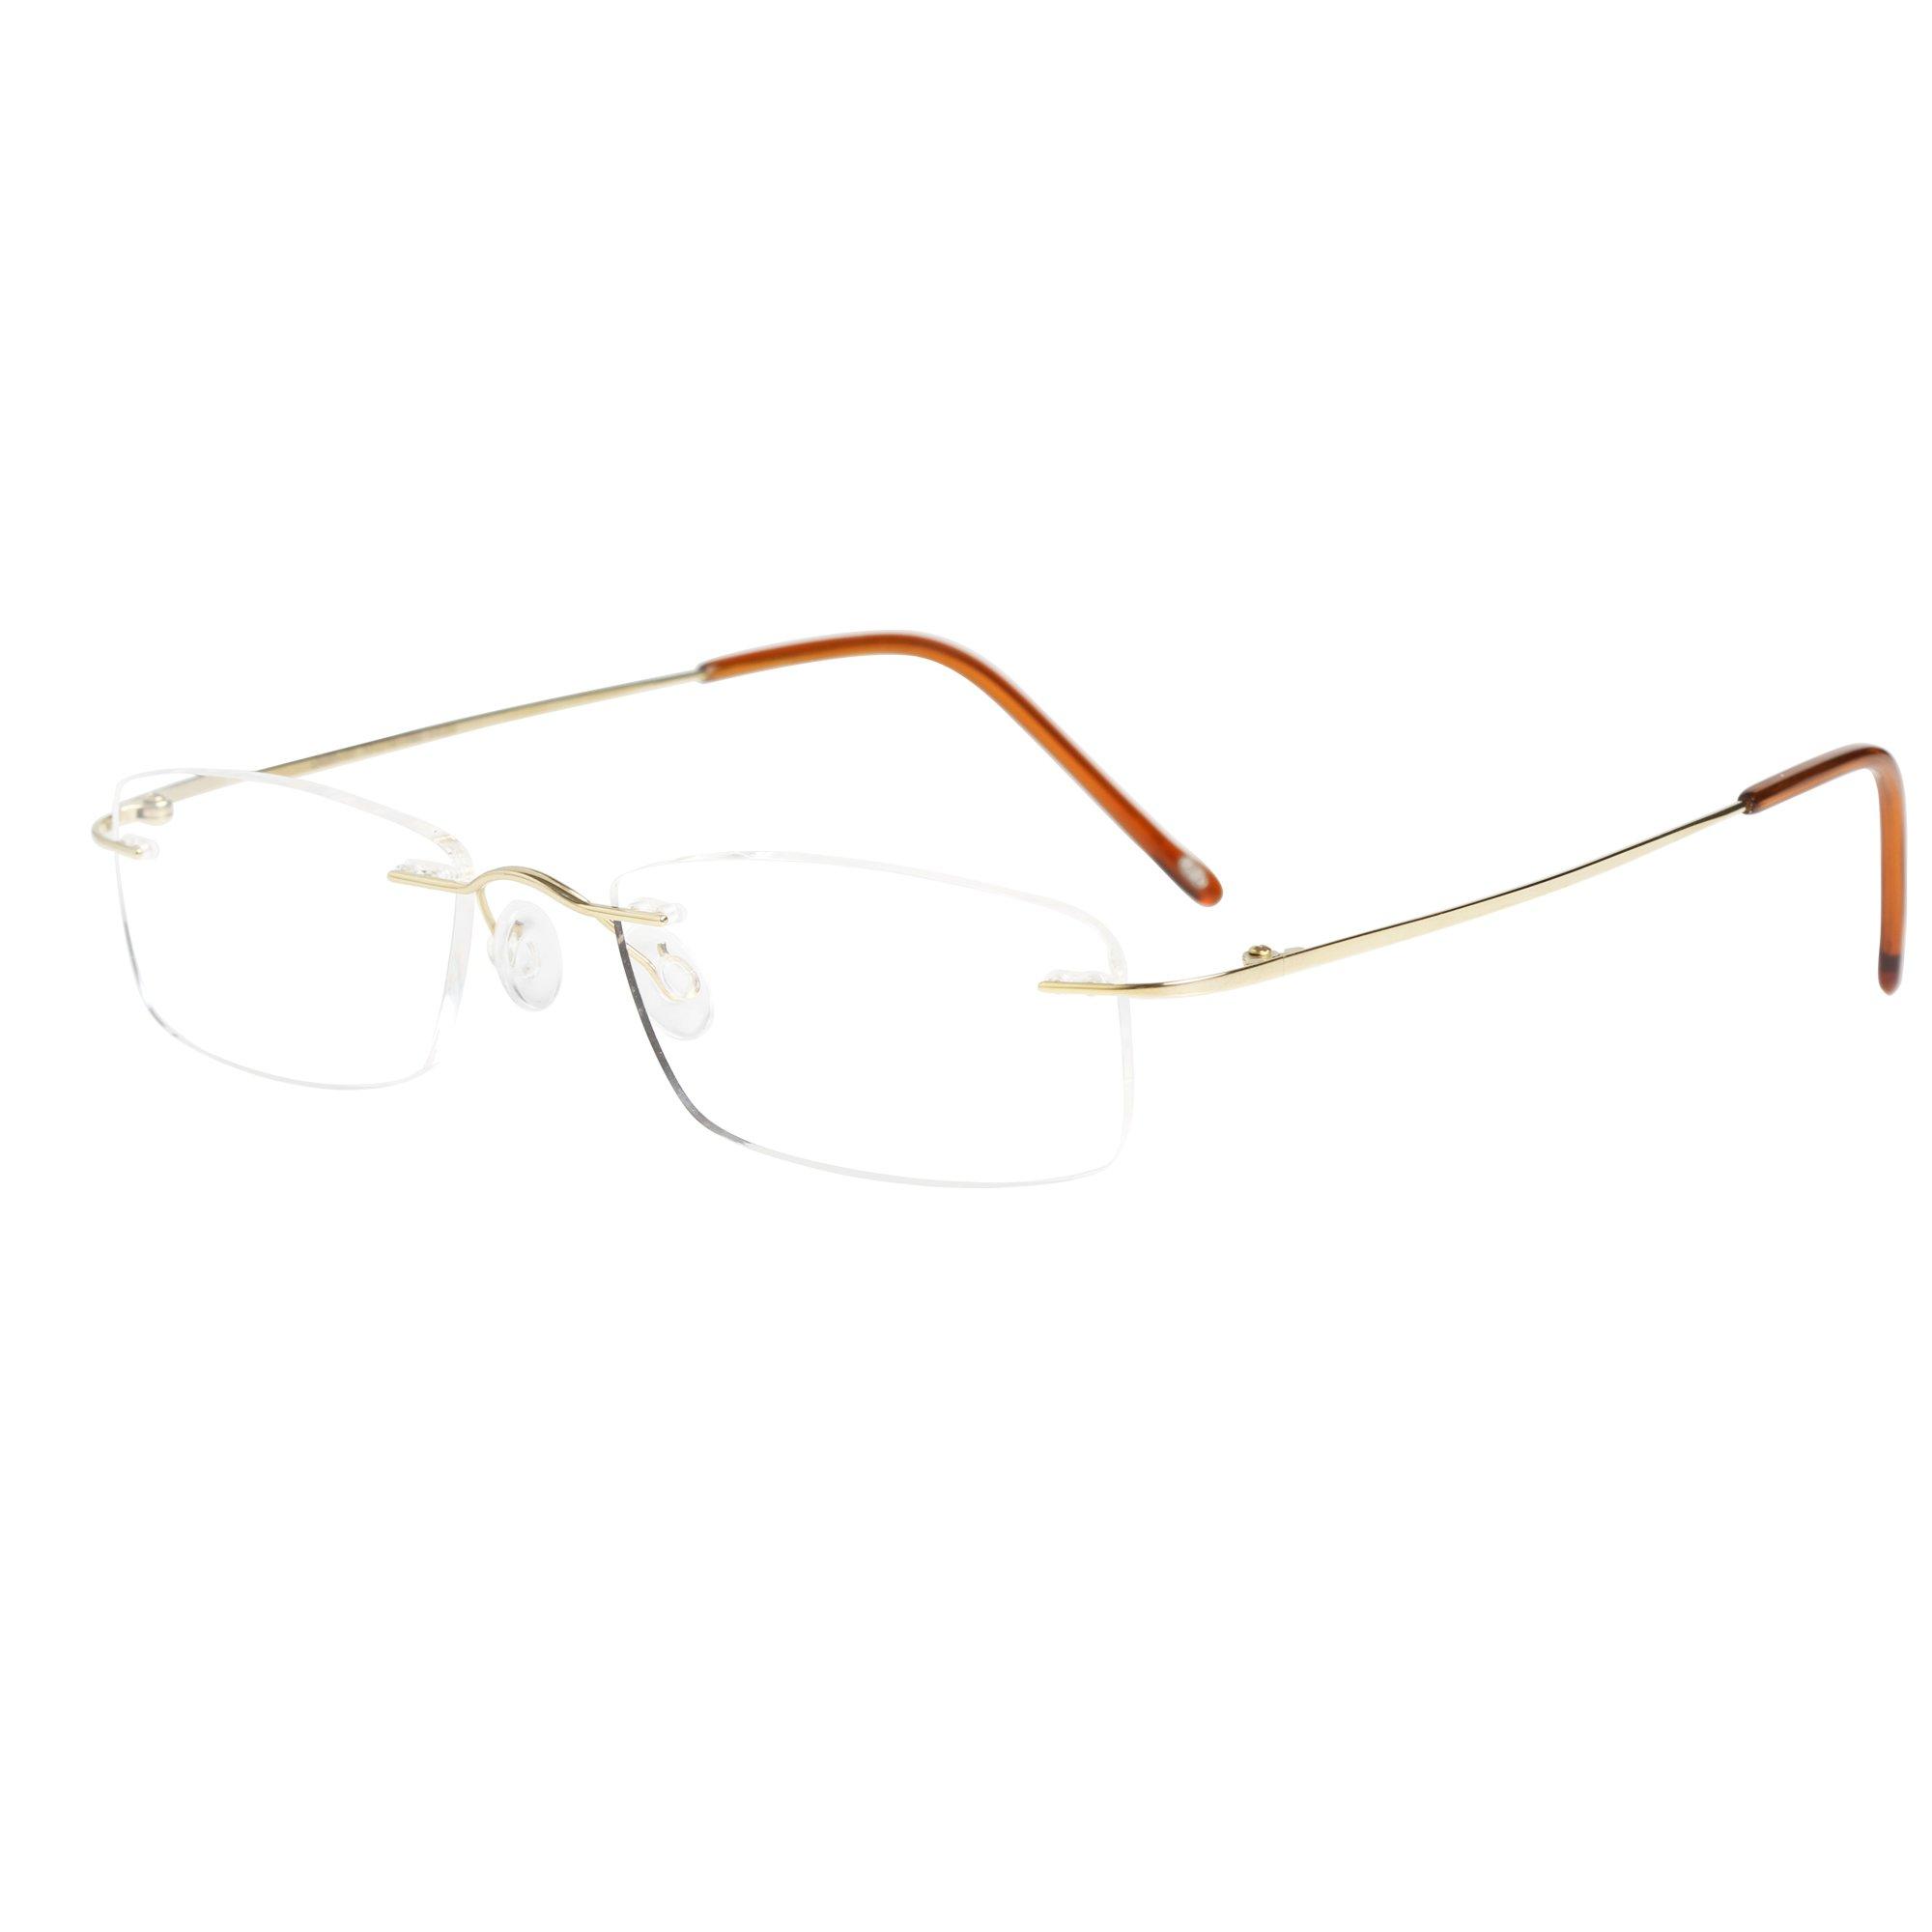 d99663b9178 LianSan Titanium Lightweight Reading Glasses Men Womens Fashion Rimless  Readers Glasses 8085 (+2.50